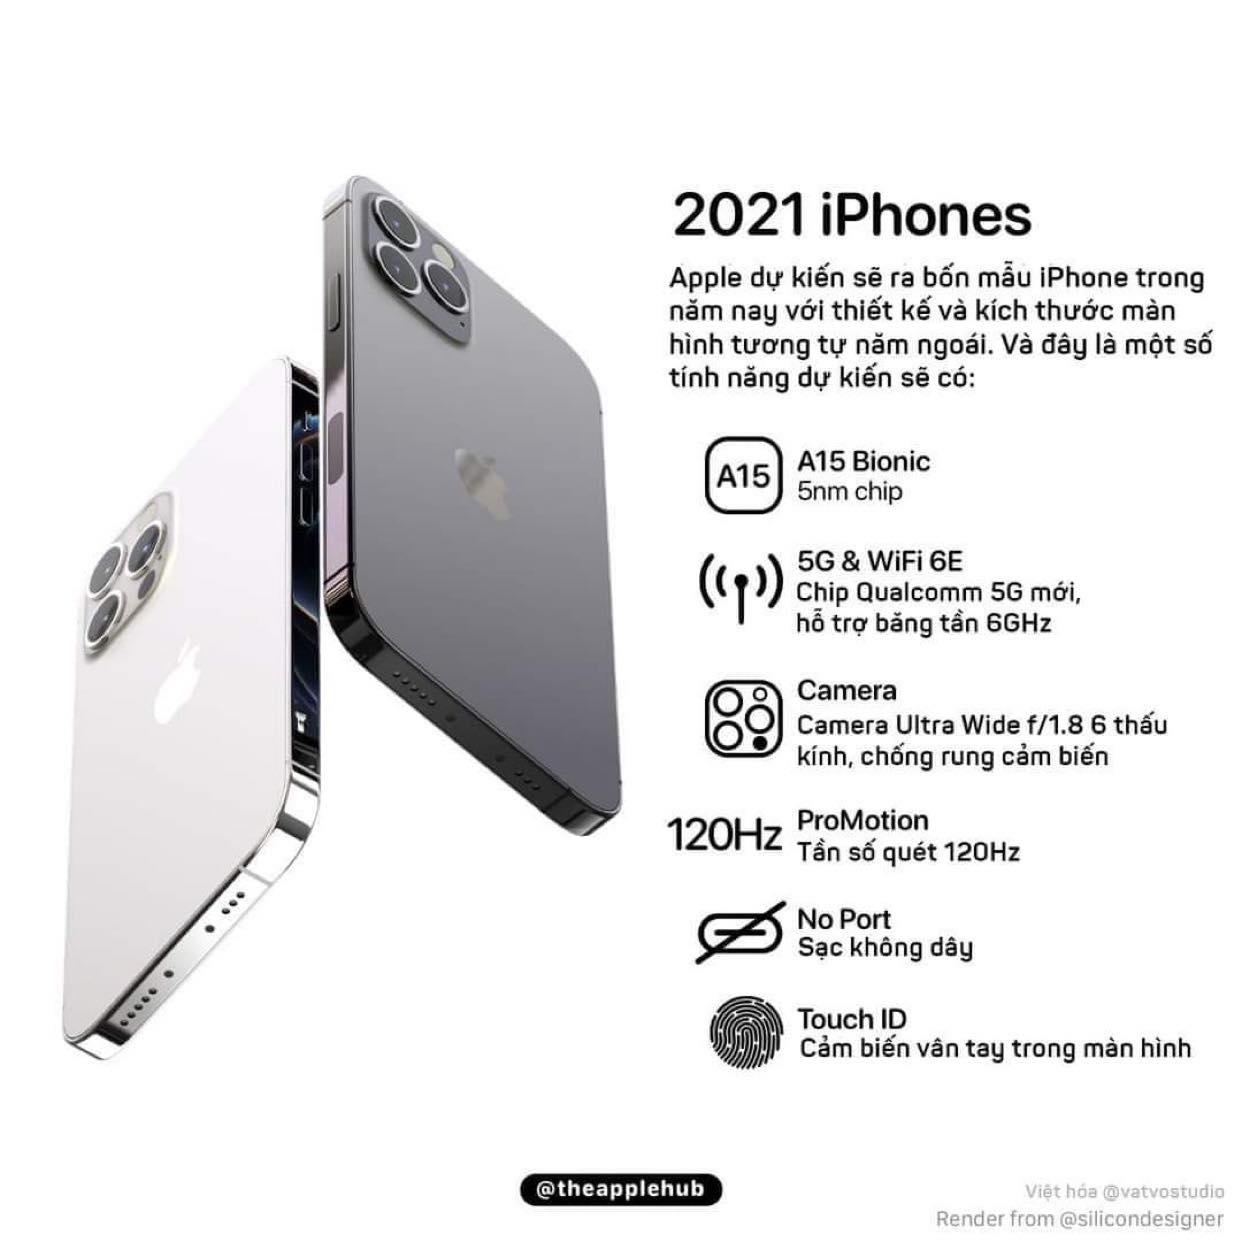 Tiết lộ cấu hình iPhone 13